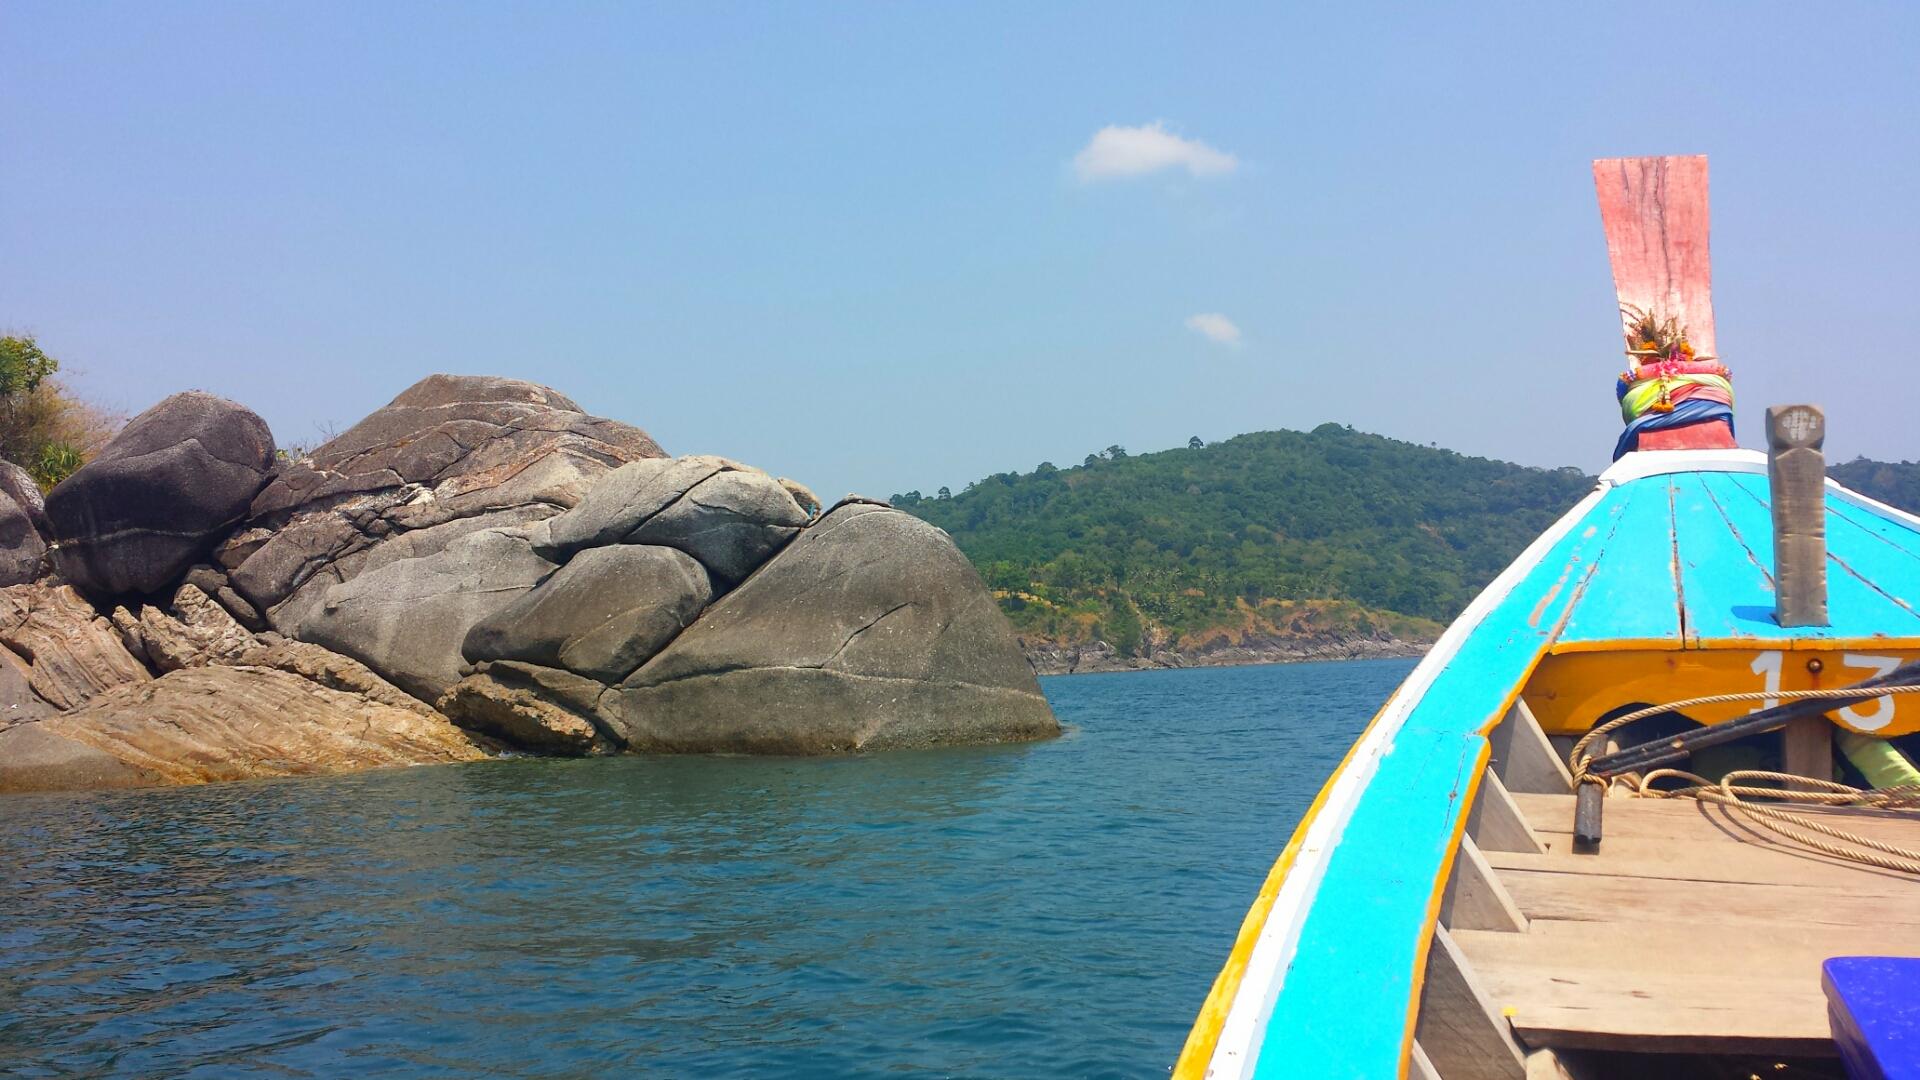 Island_Phuket_Thailand_South_East_Asia